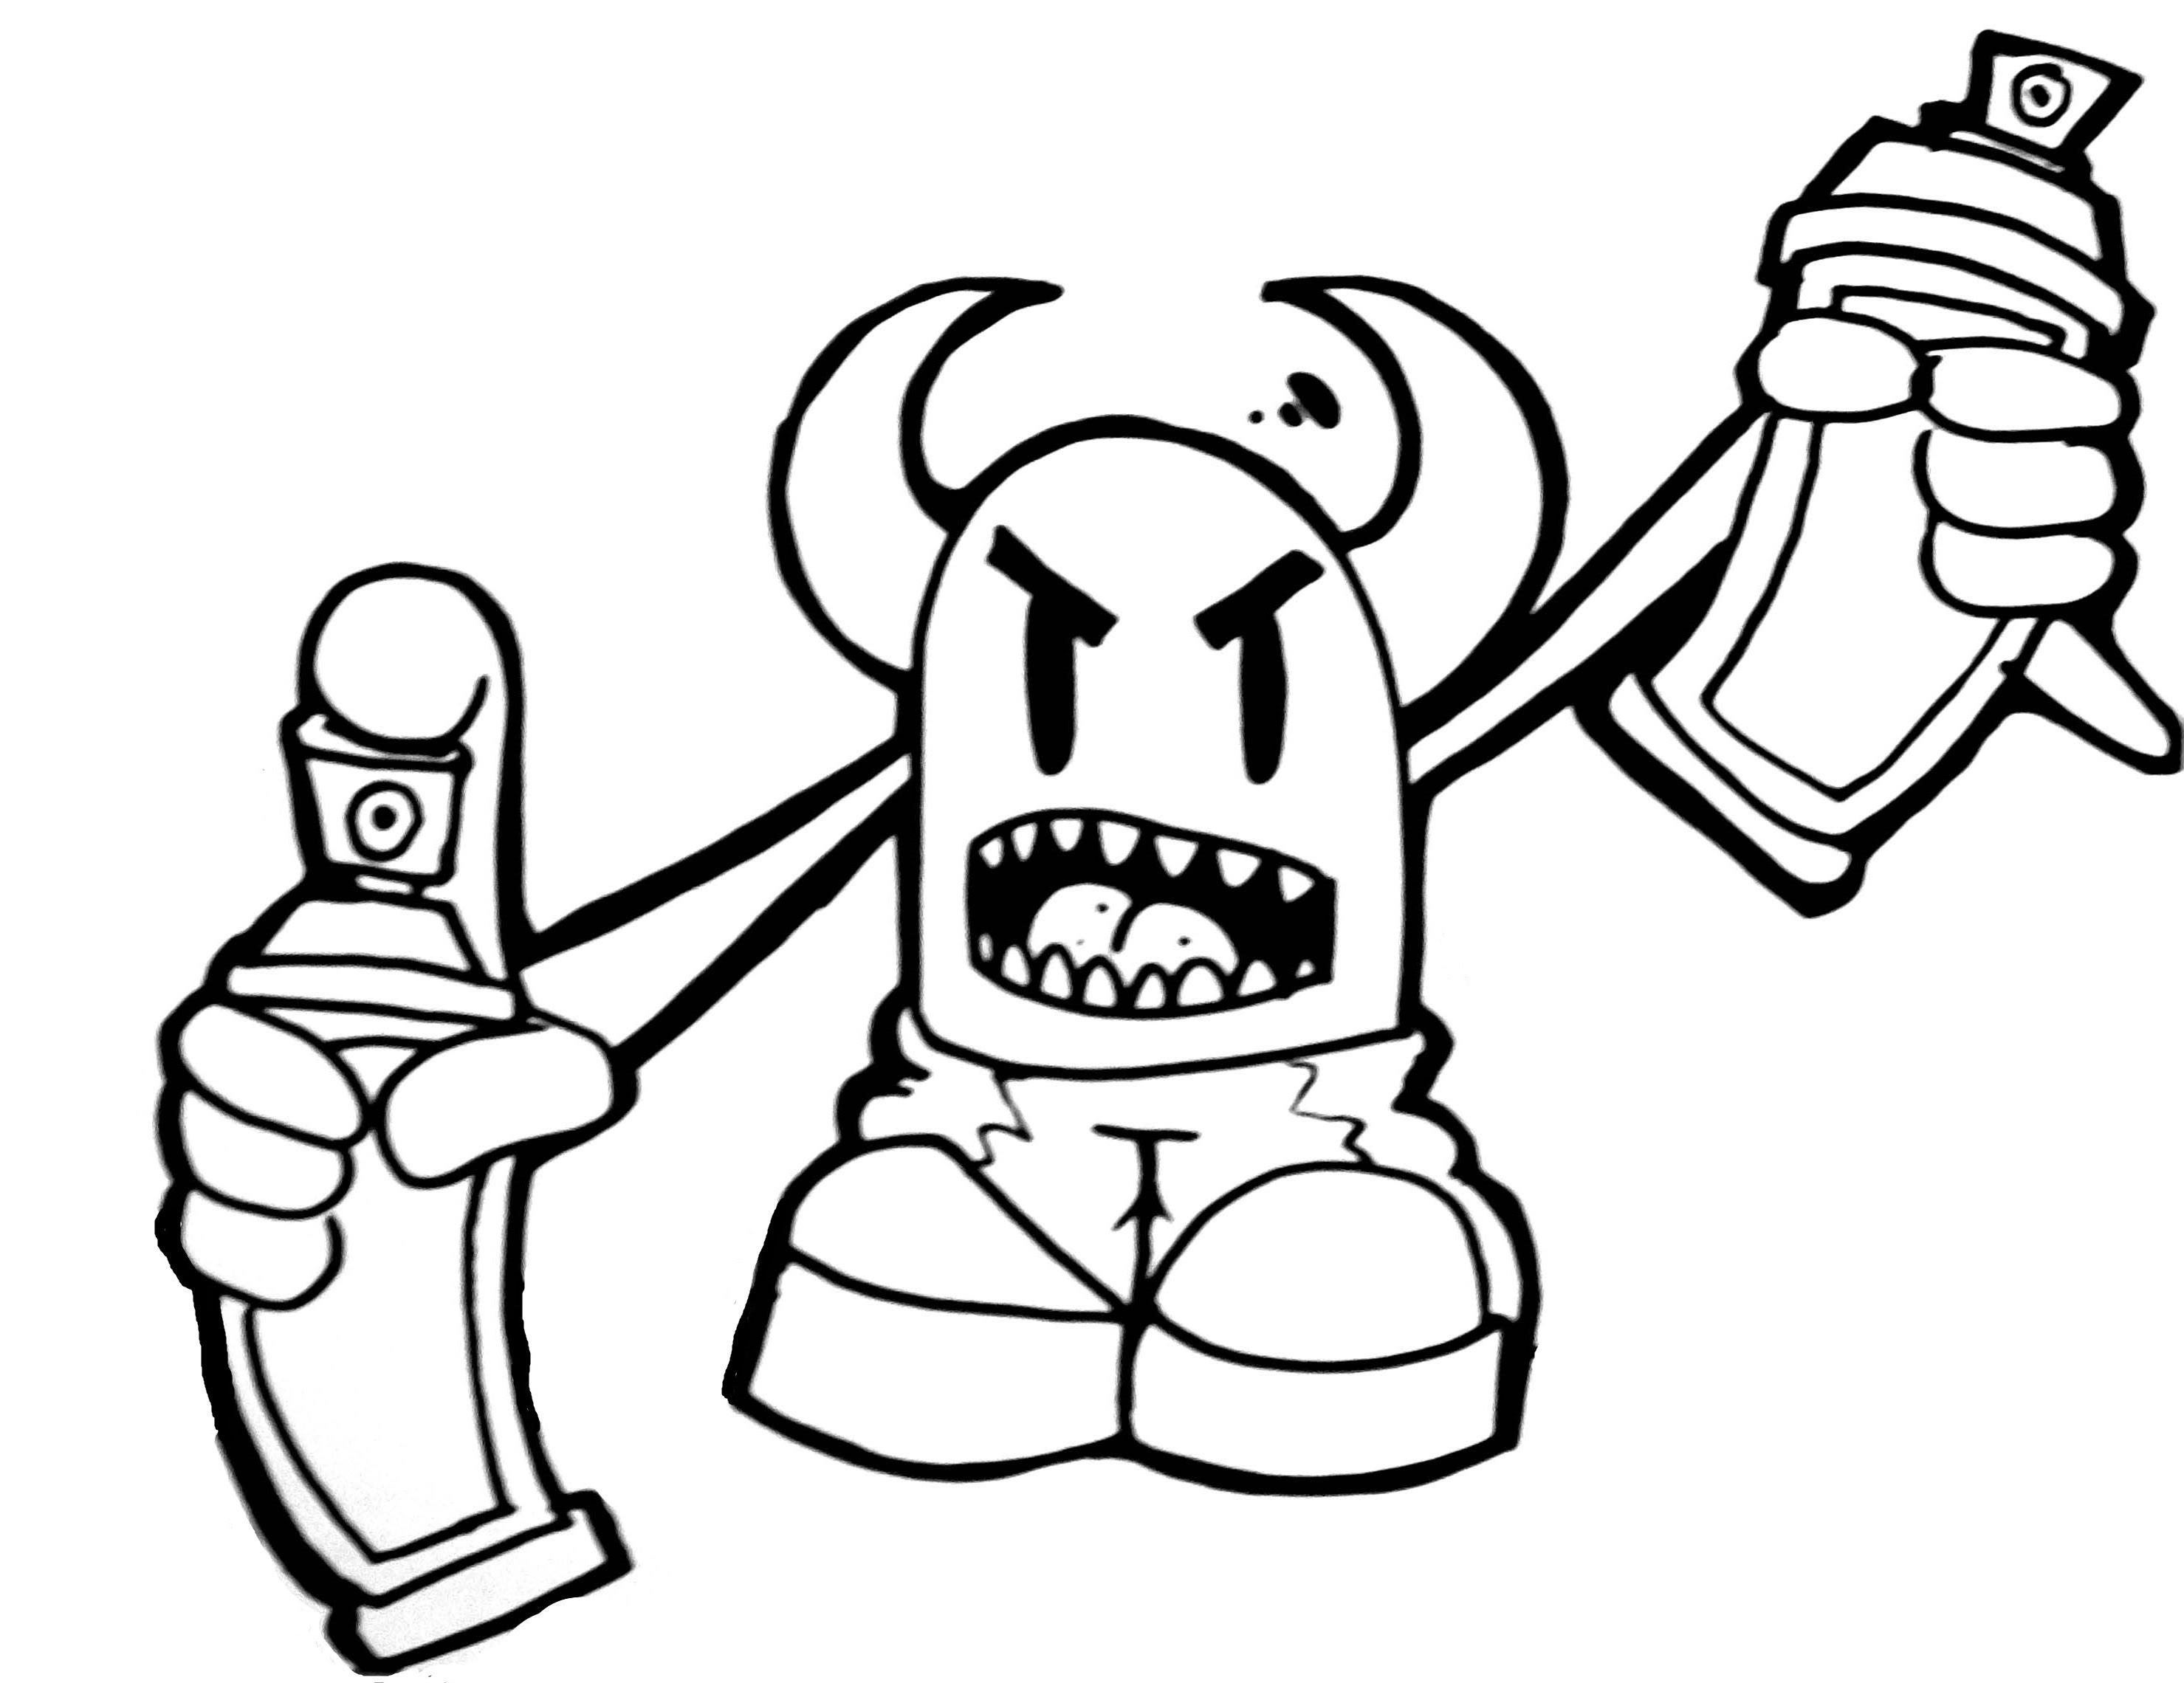 2958x2280 Graffiti Monster Doodle Doodle Graffiti Simple Tag Doodle Art